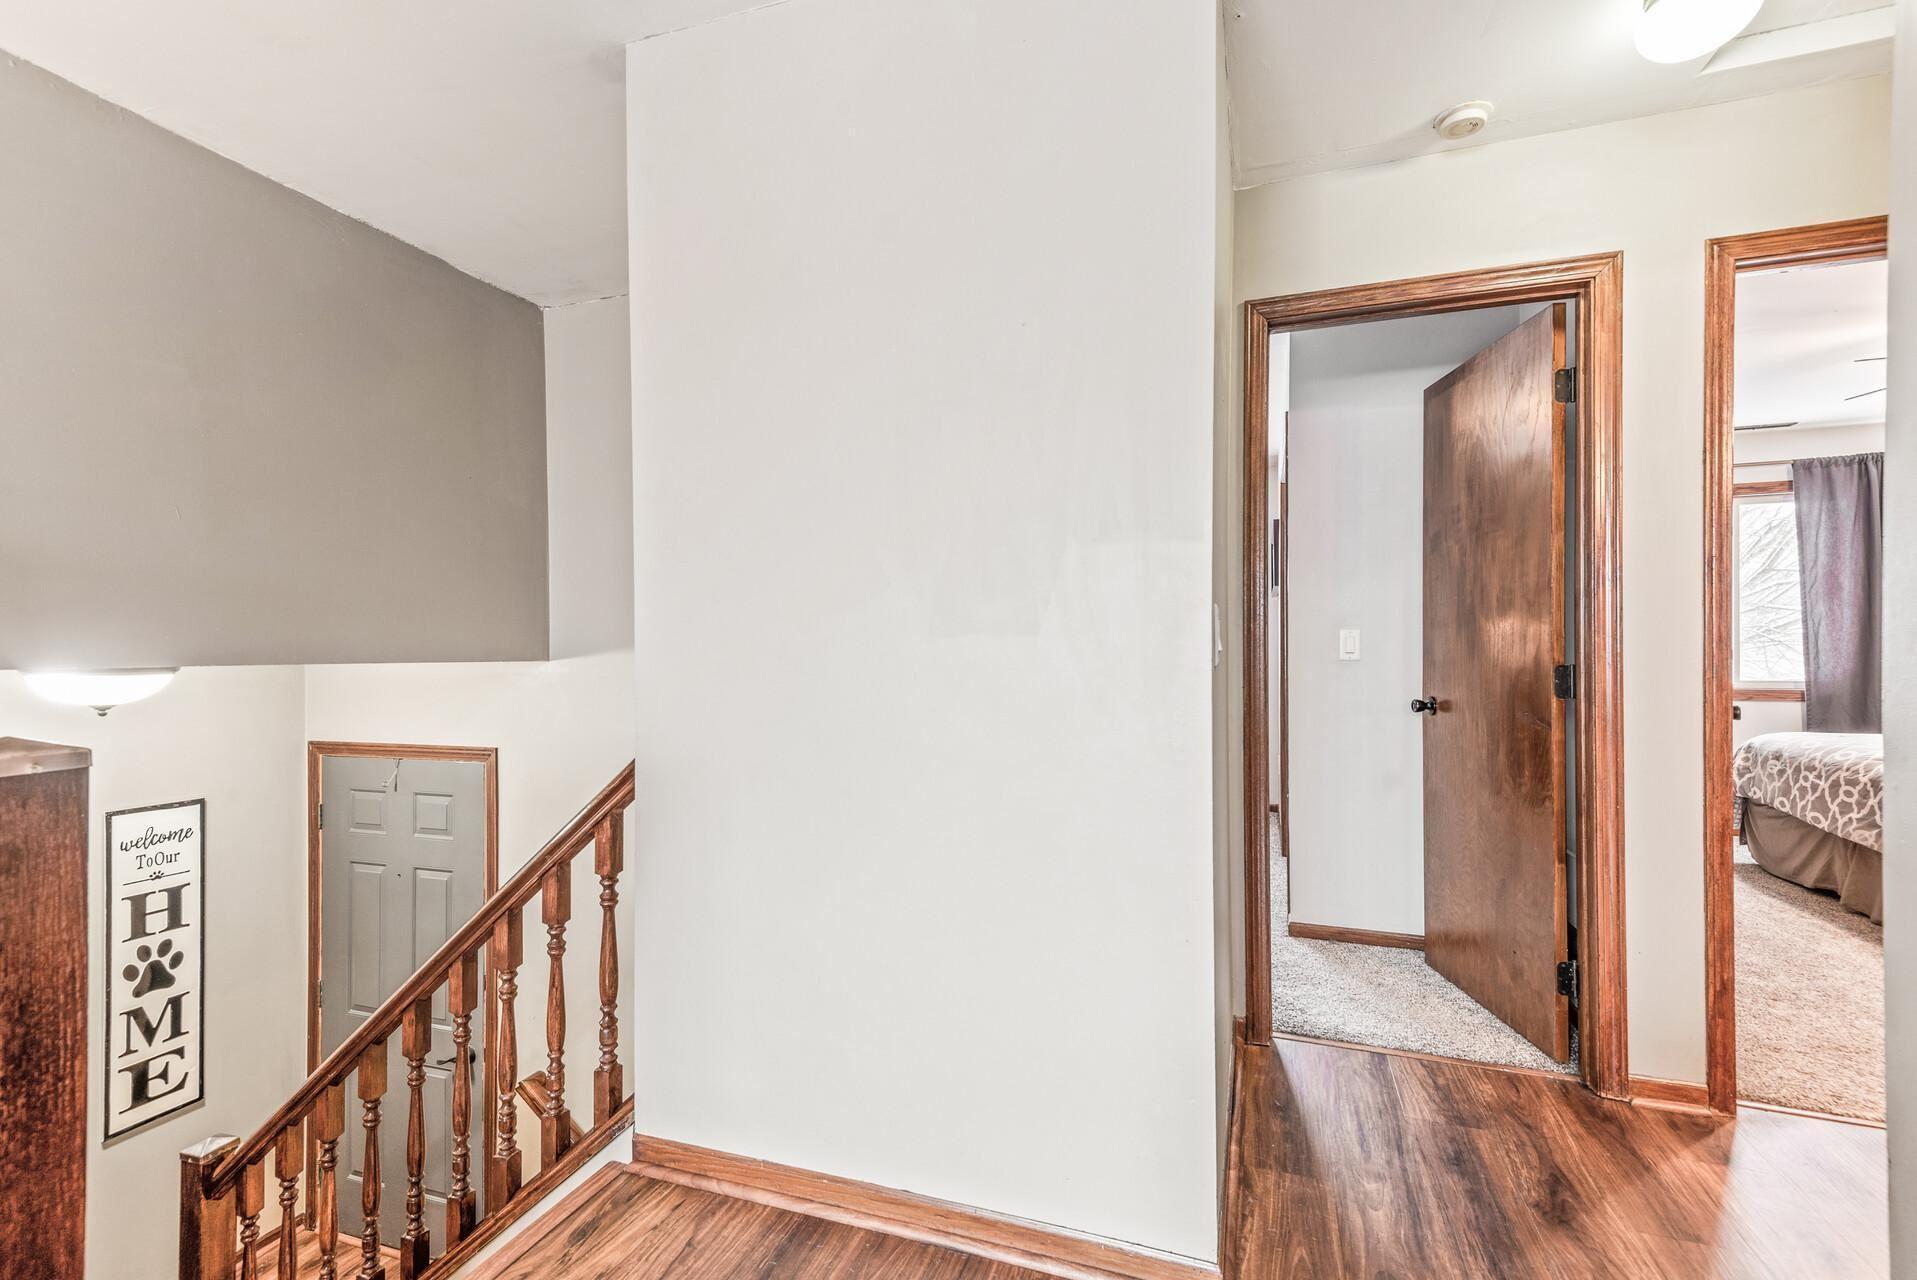 Photo of 5319 184th Street W, Farmington, MN 55024 (MLS # 5701865)